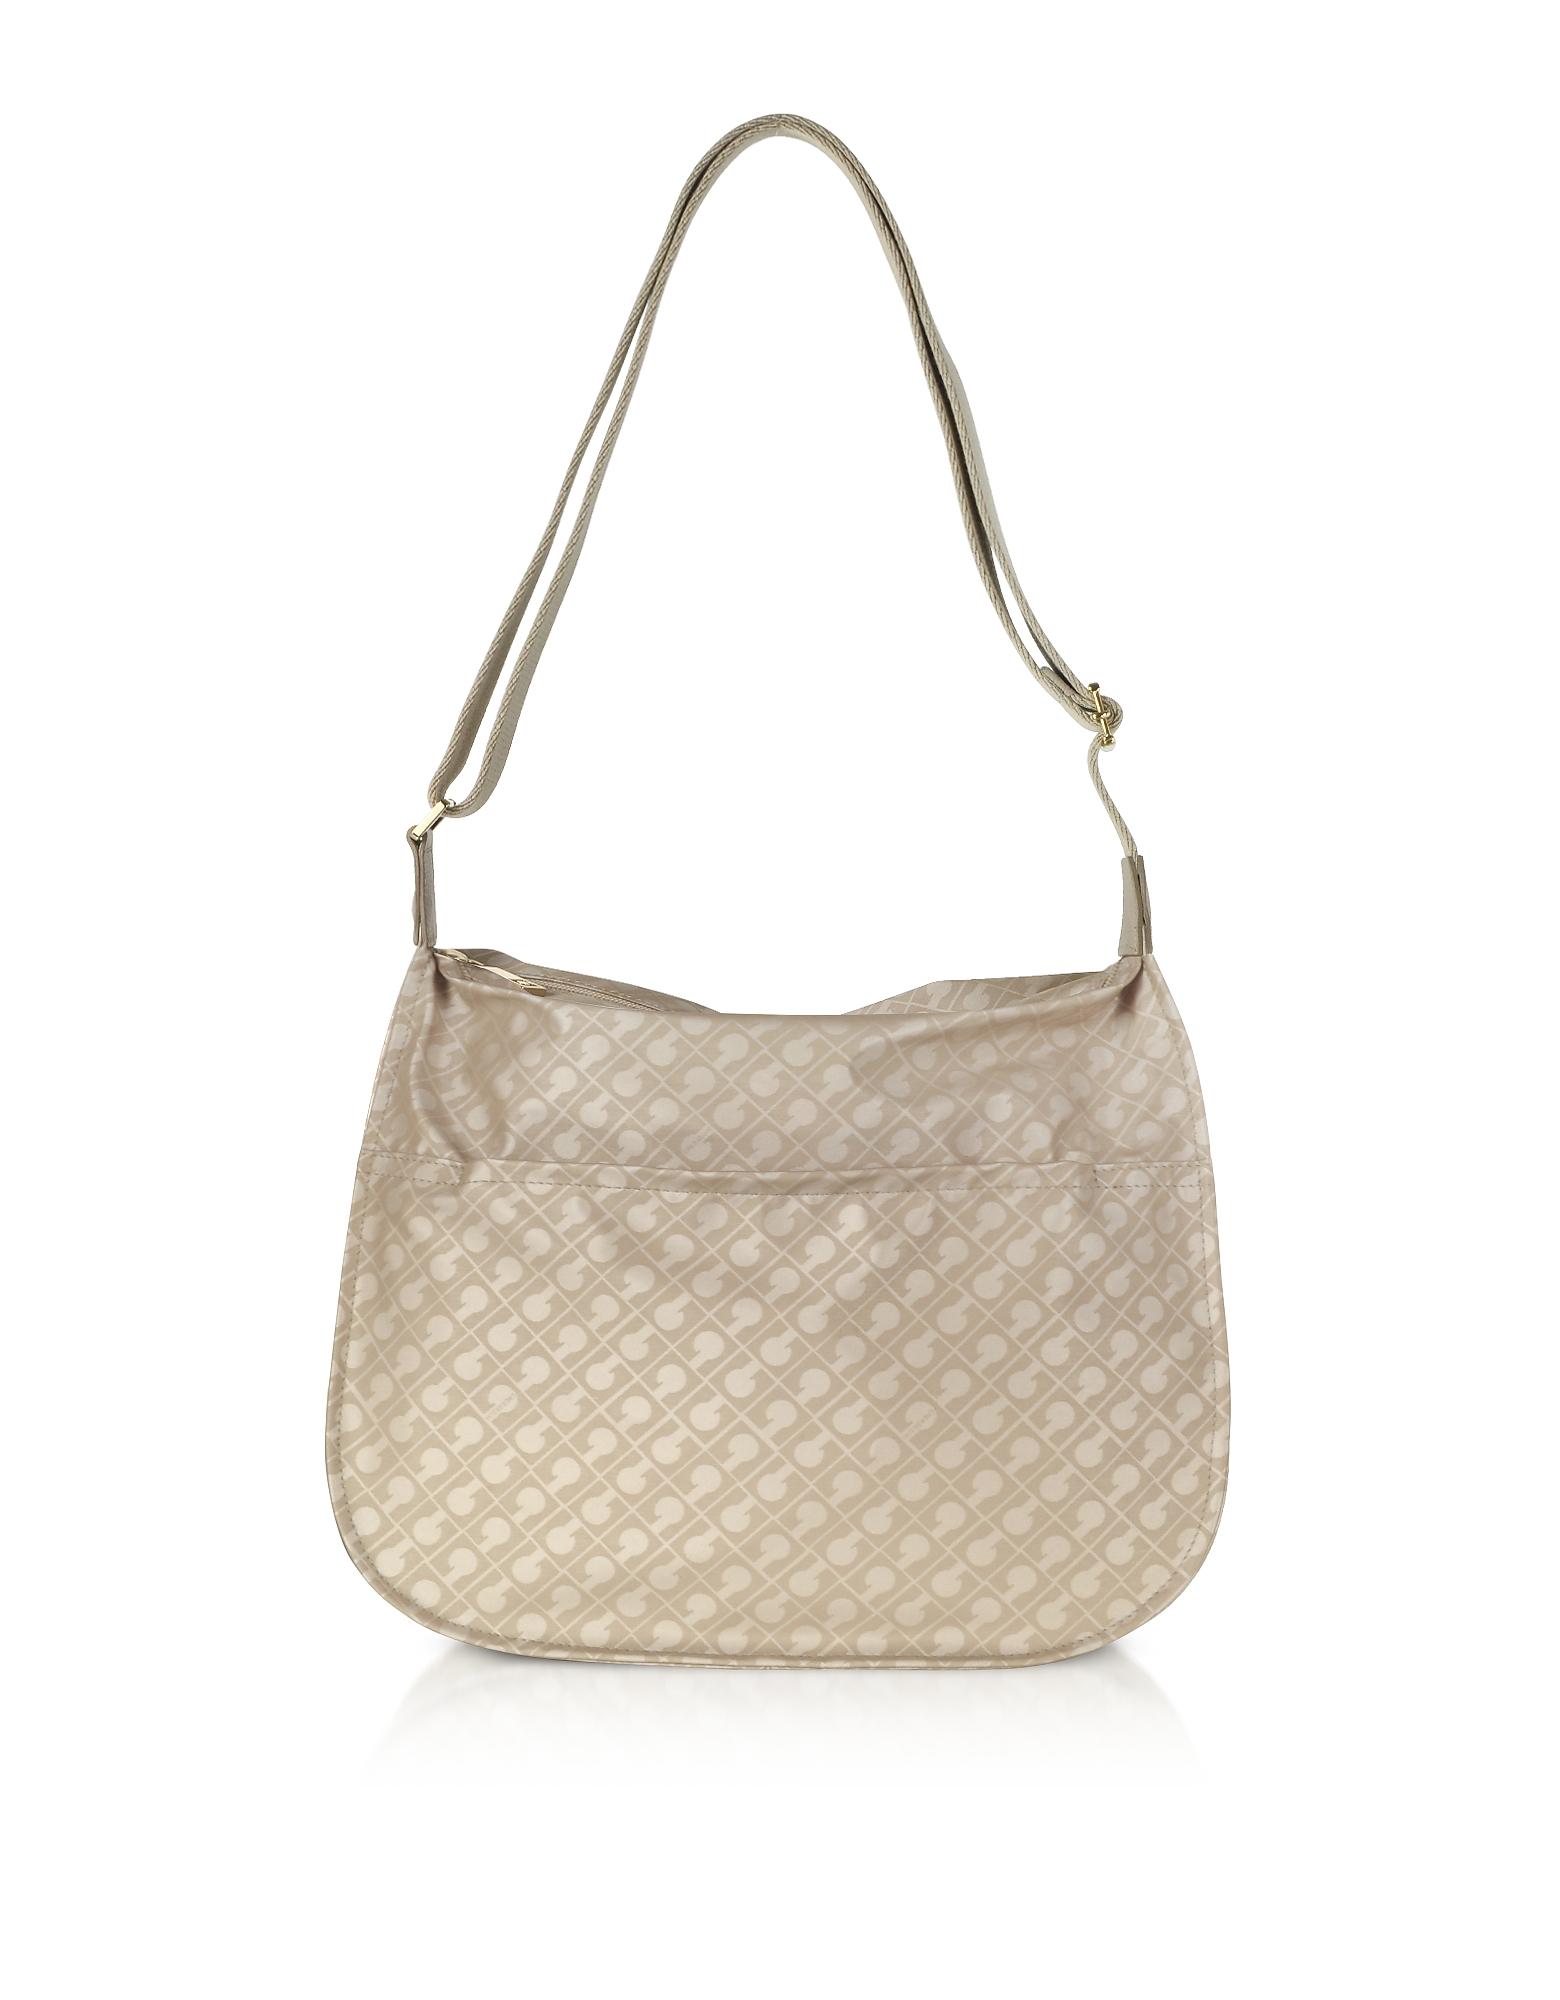 Gherardini Handbags, Signature Coated Canvas Softy Shoulder Bag